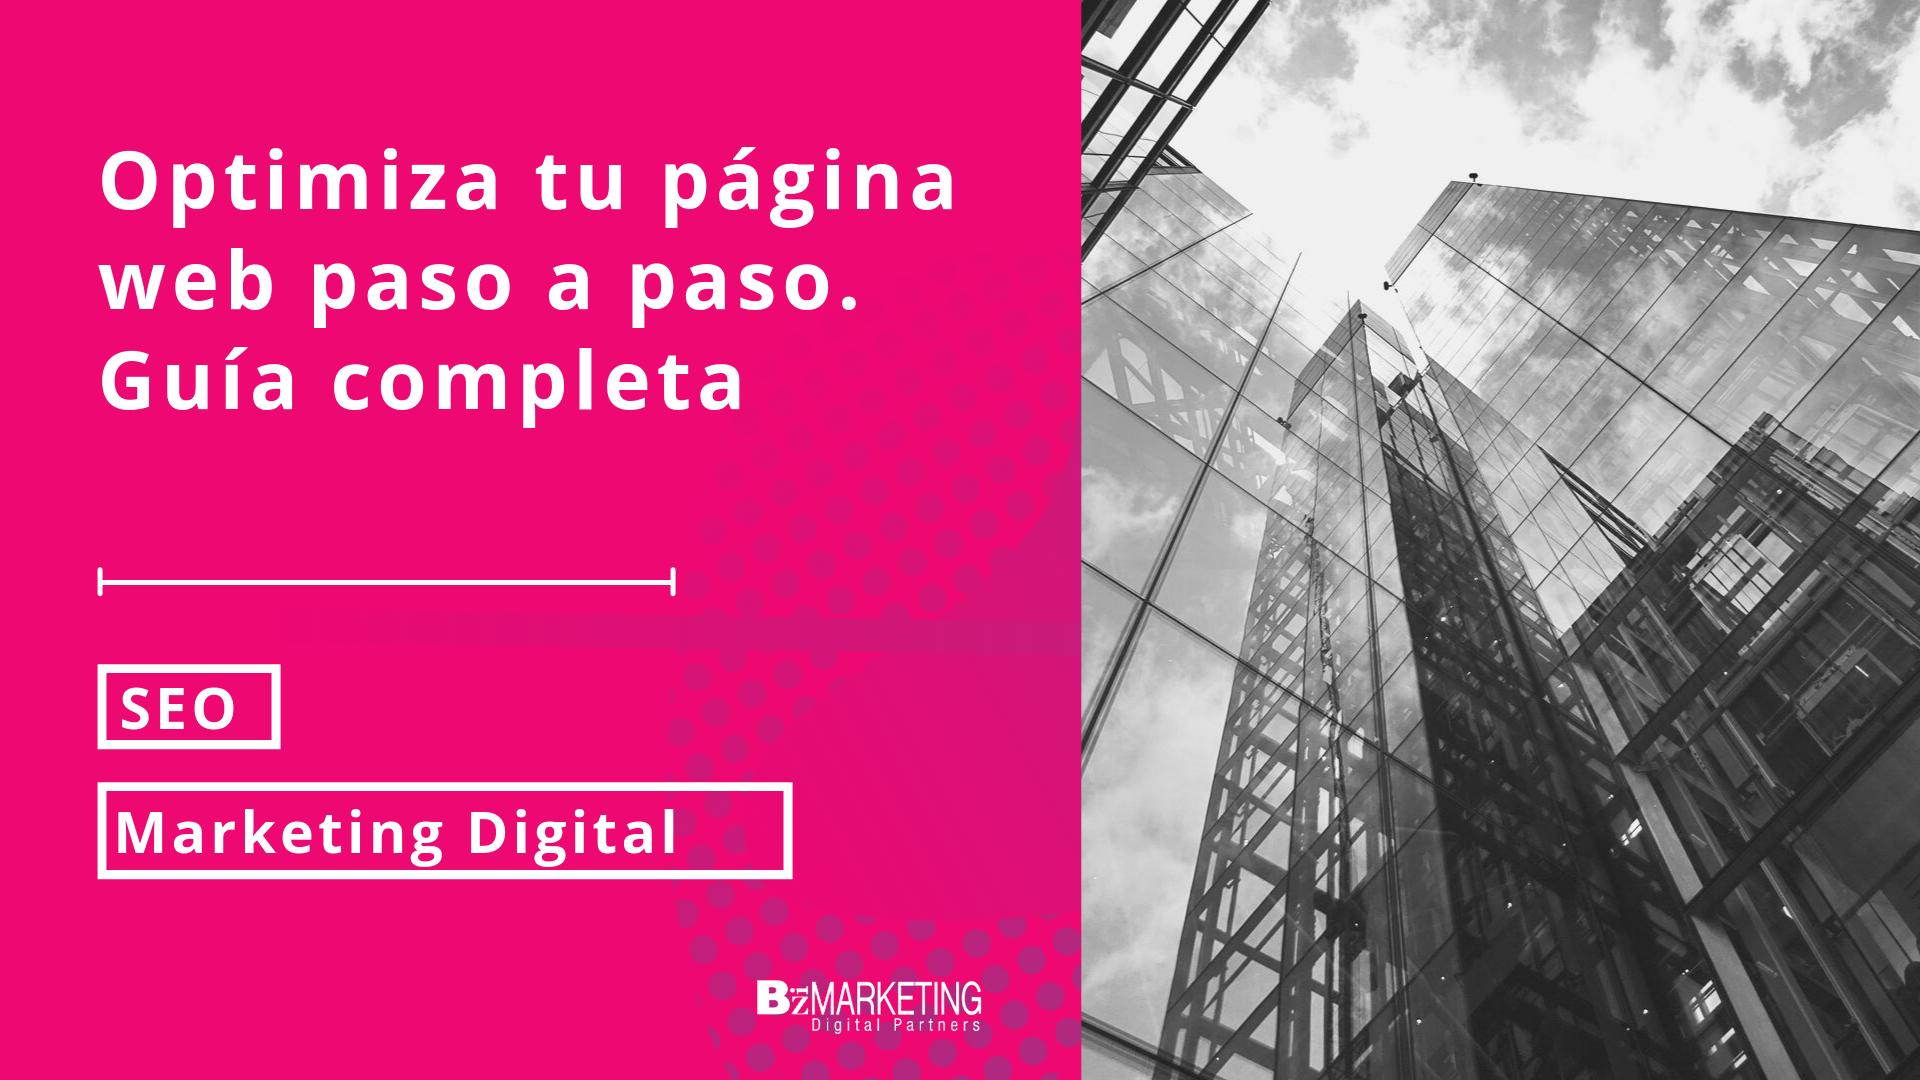 optimiza-tu-pagina-web-guia-completa-inbound-marketing-bizmarketing